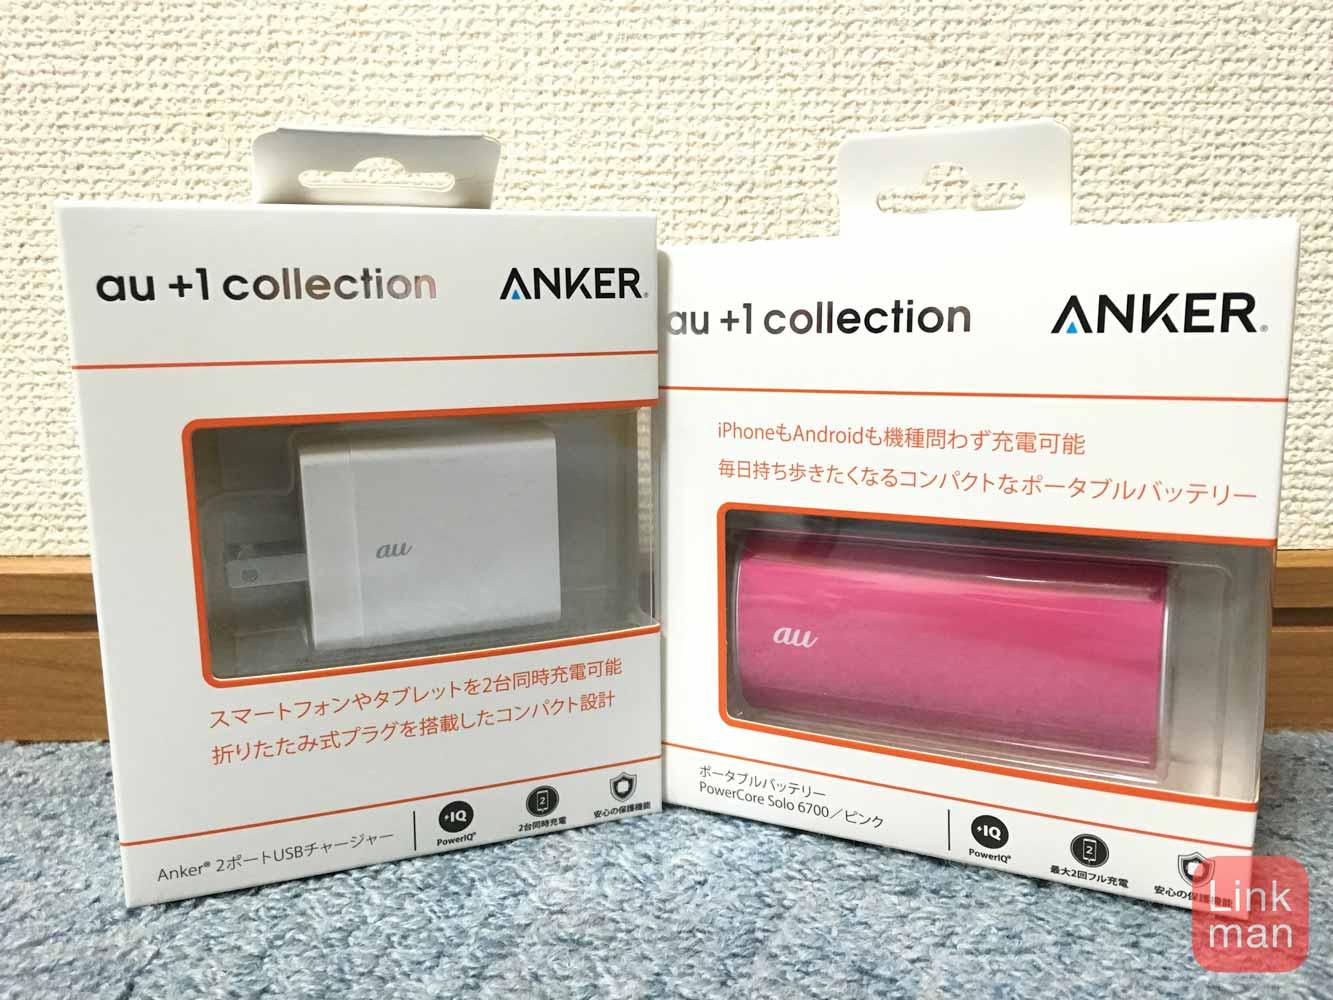 Anker、auとのコラボレーション第二弾として2種類のモバイルバッテリーとUSB急速充電器を発売【レビューあり】